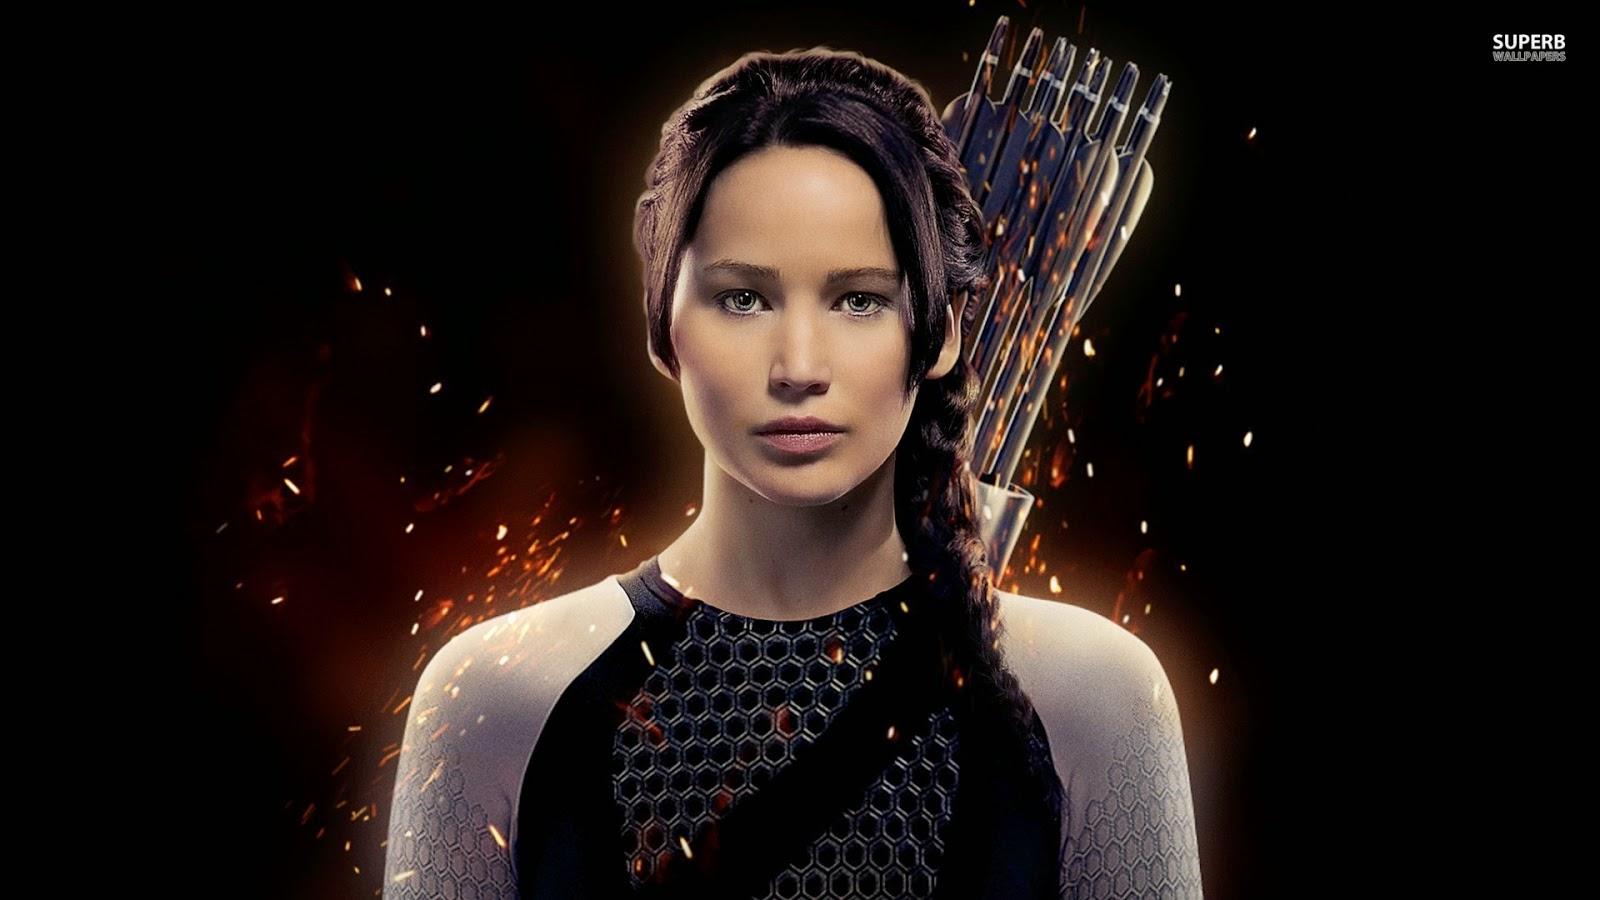 Jennifer Lawrence Wallpaper 1080p